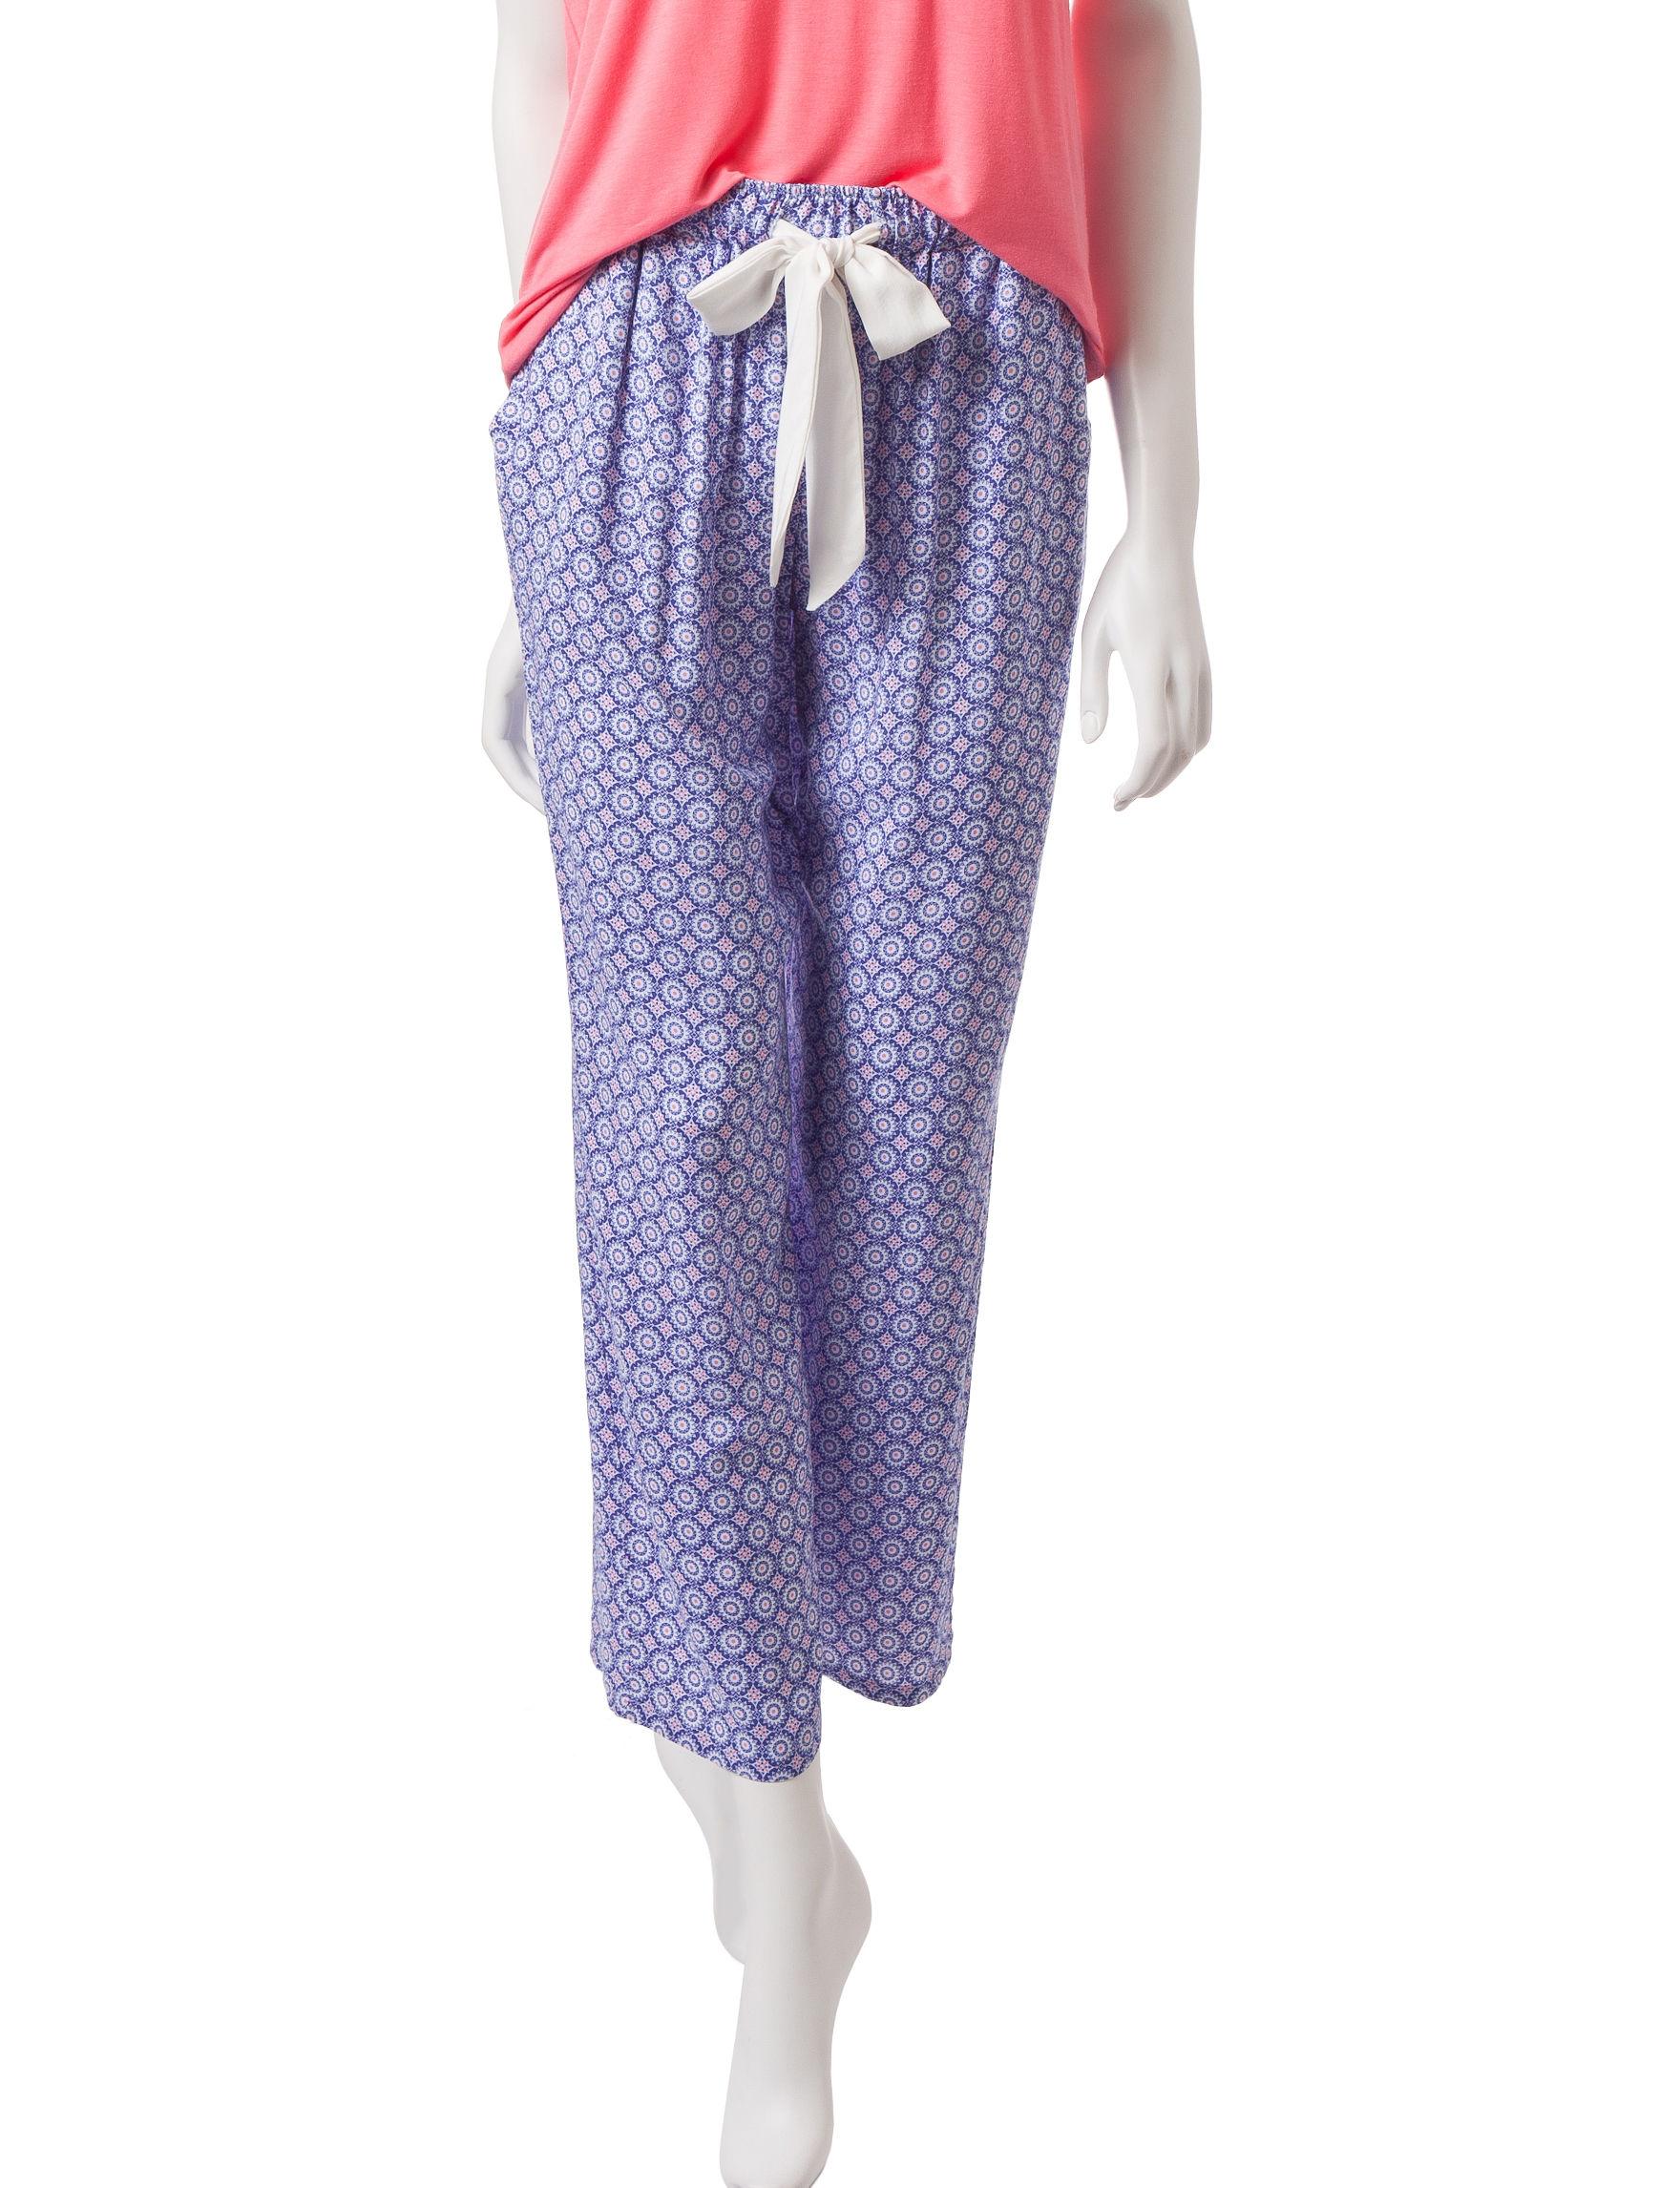 Laura Ashley Blue / Coral Pajama Bottoms